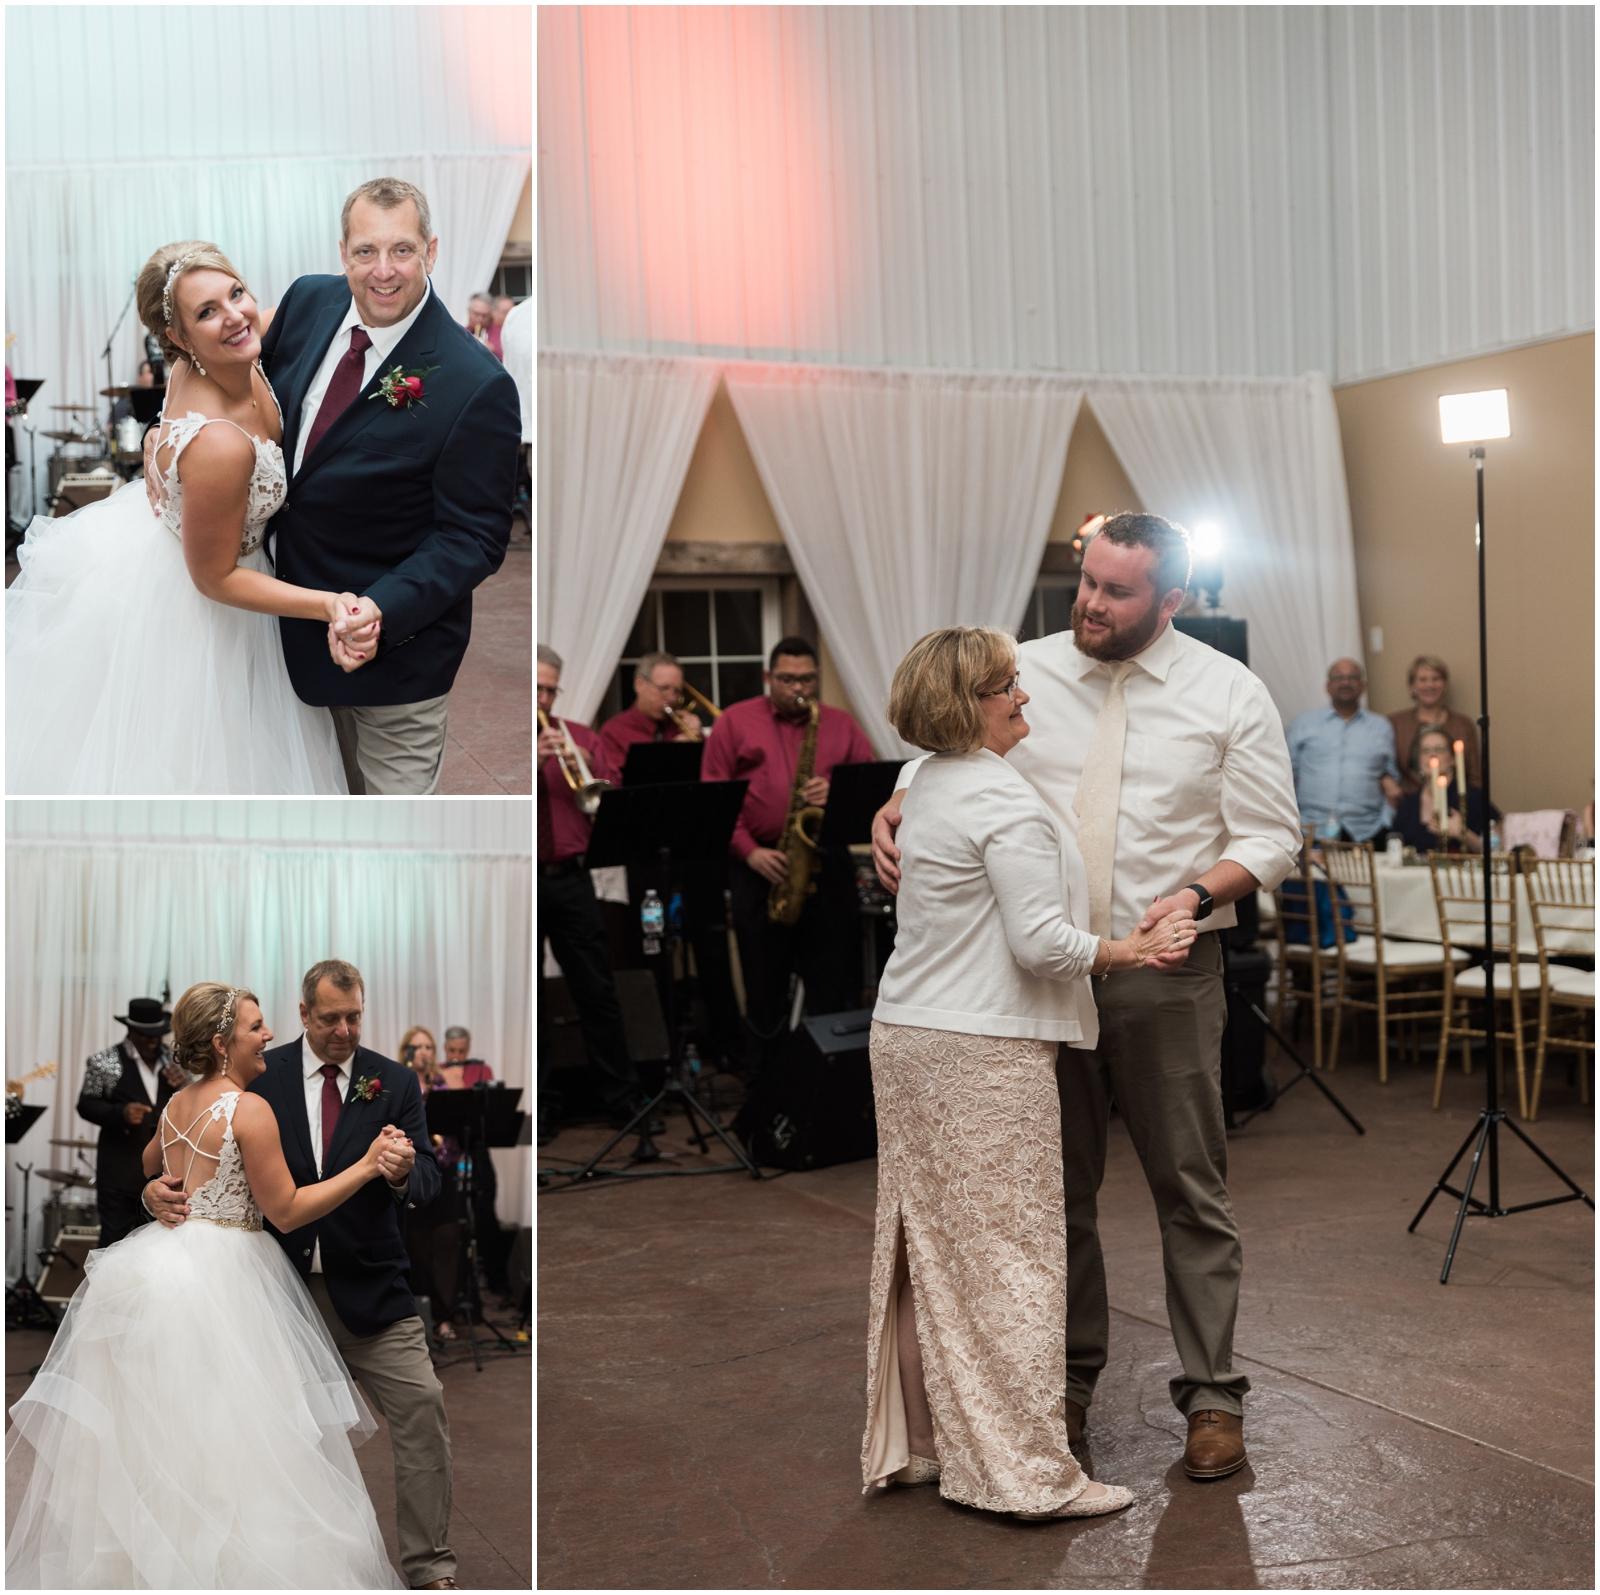 Minnesota-Wedding-Venue- Chaska-MN-Rustic-Barn-Weddings_0594.jpg